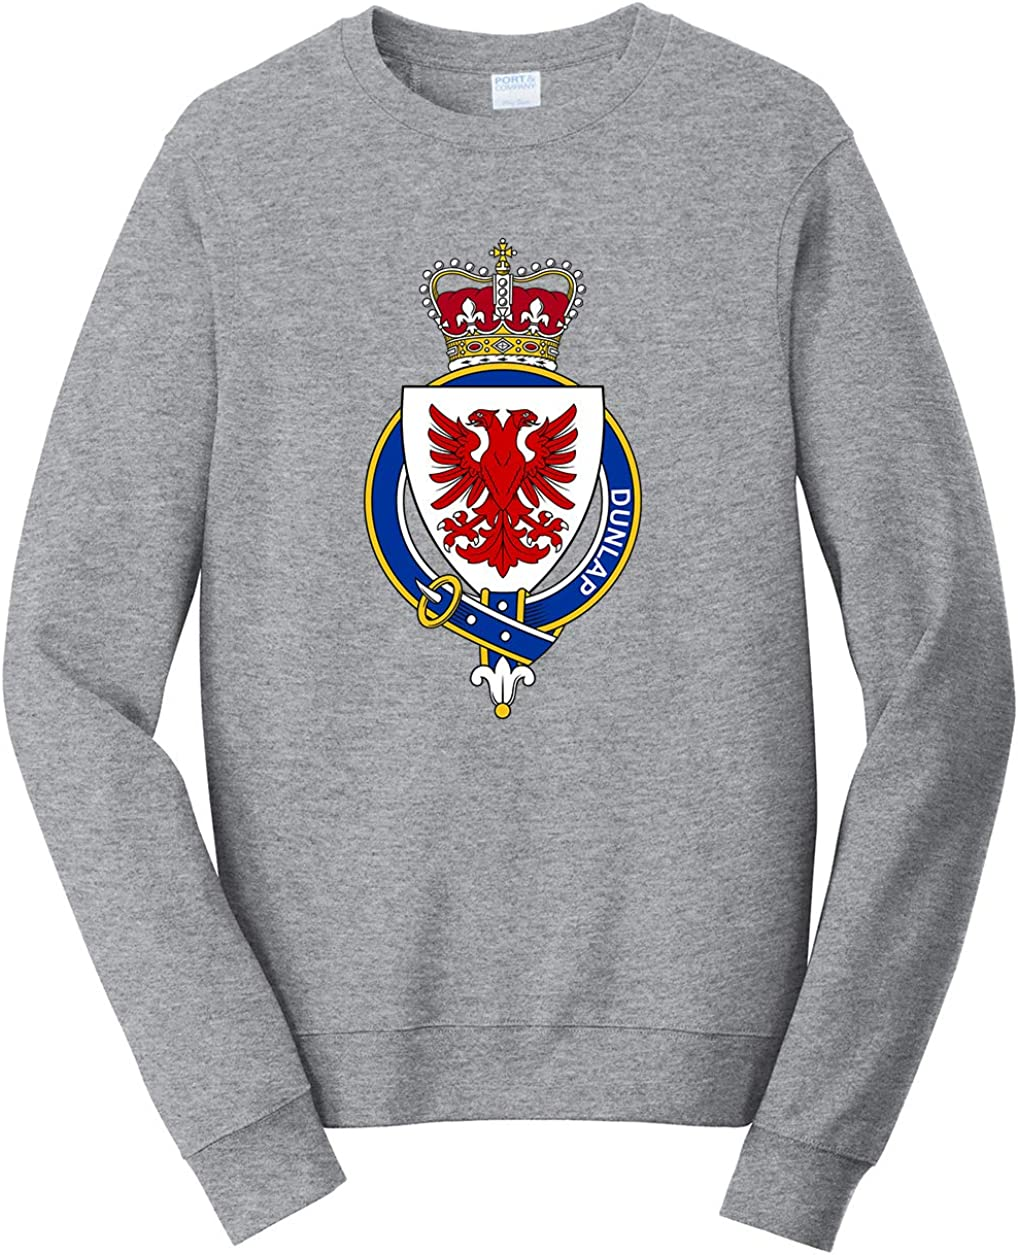 Tenacitee Unisex Scottish Garter Family Dunlap Sweatshirt